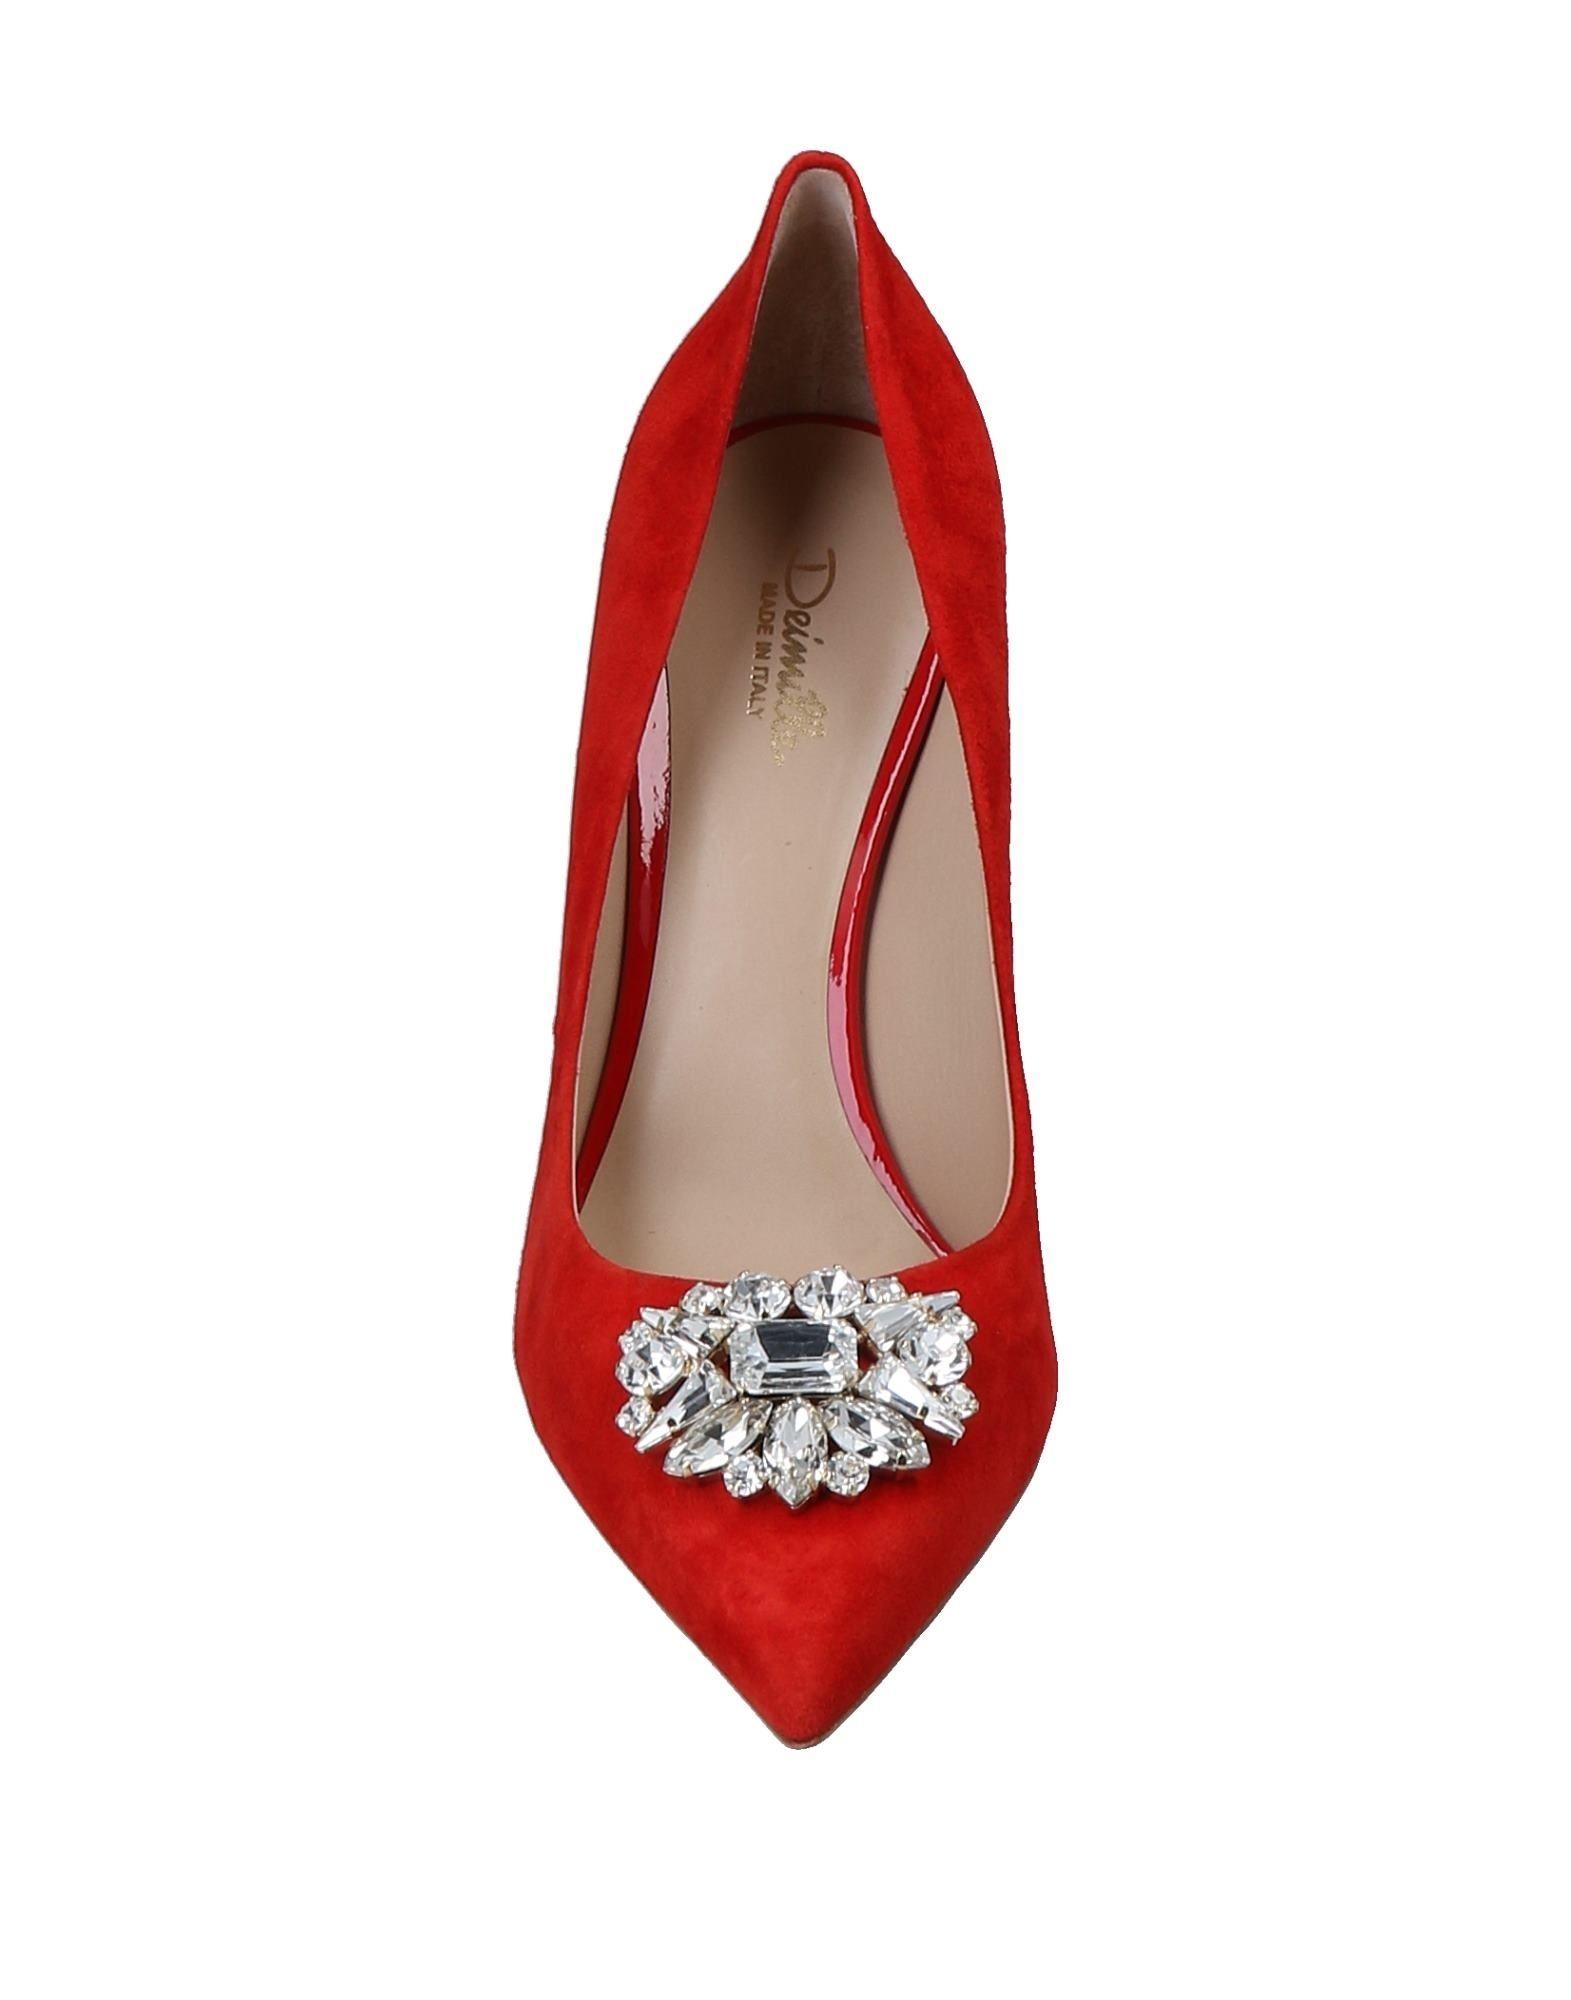 Stilvolle billige Schuhe Damen Deimille Pumps Damen Schuhe  11557008CD 6e30c3